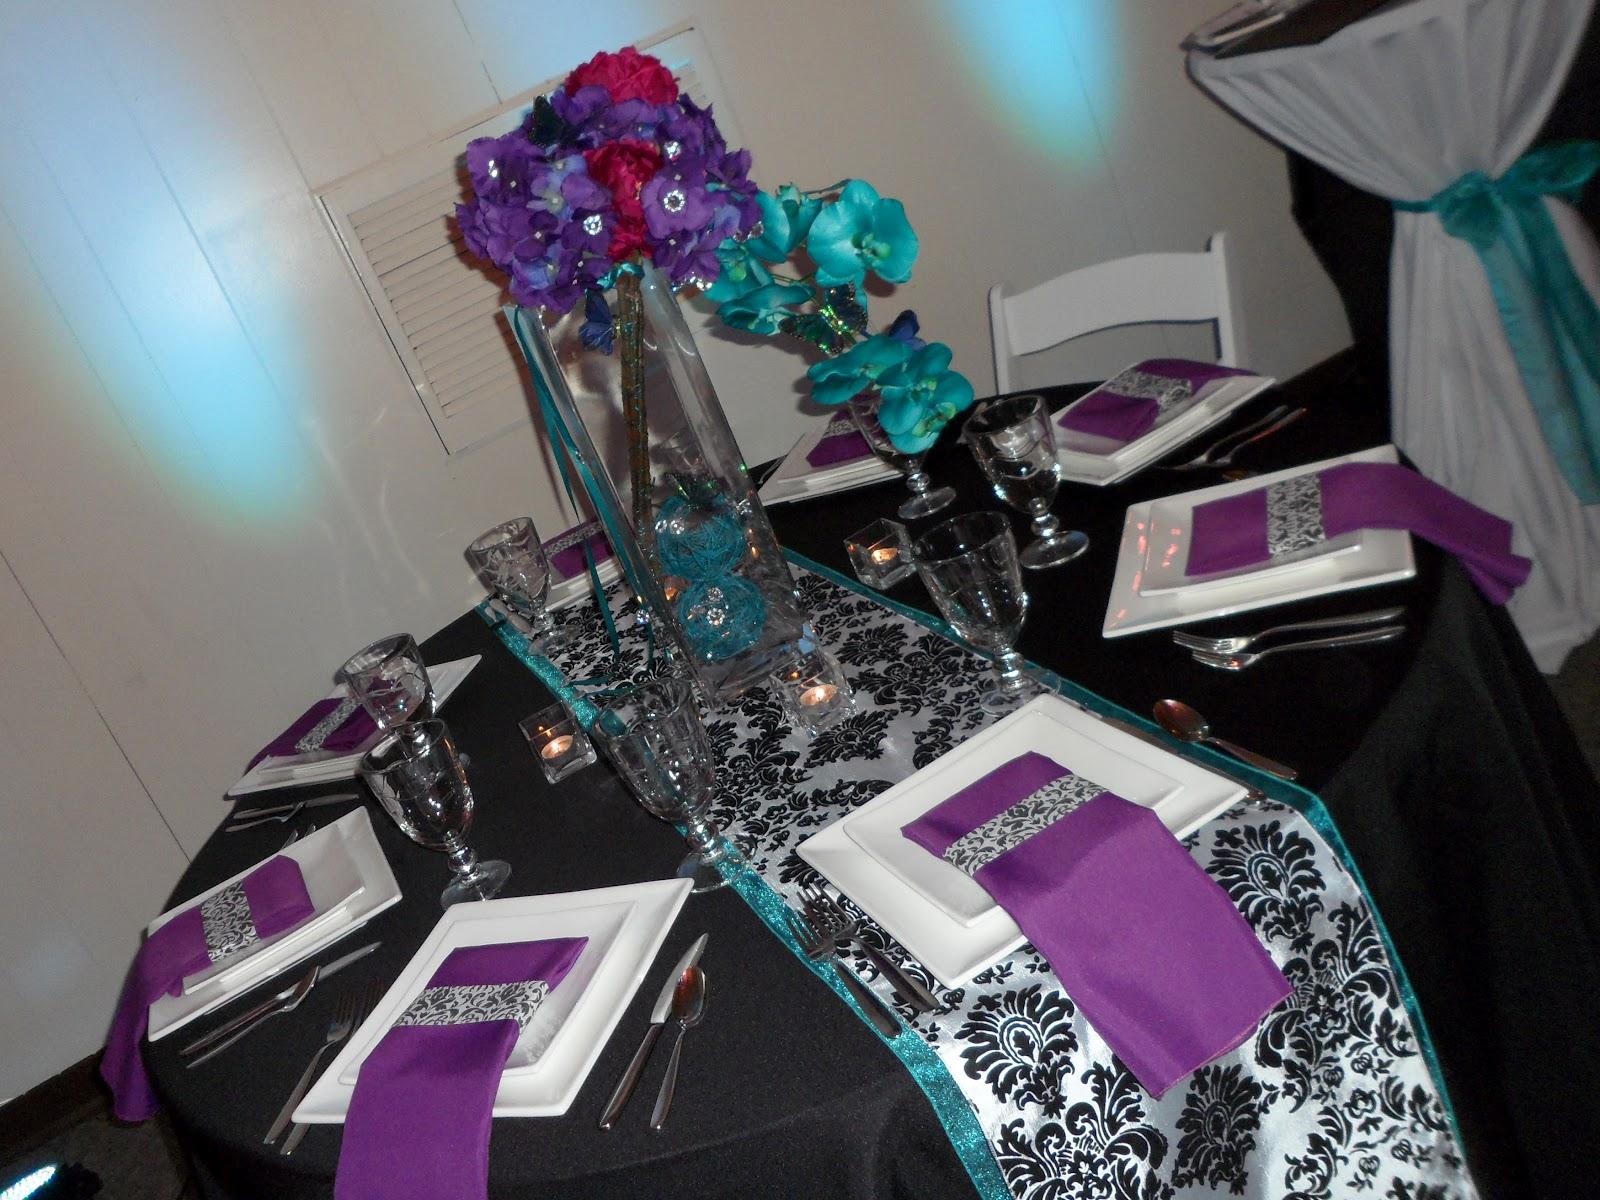 Teal And Purple Wedding Ideas: Teal And Purple Table Display